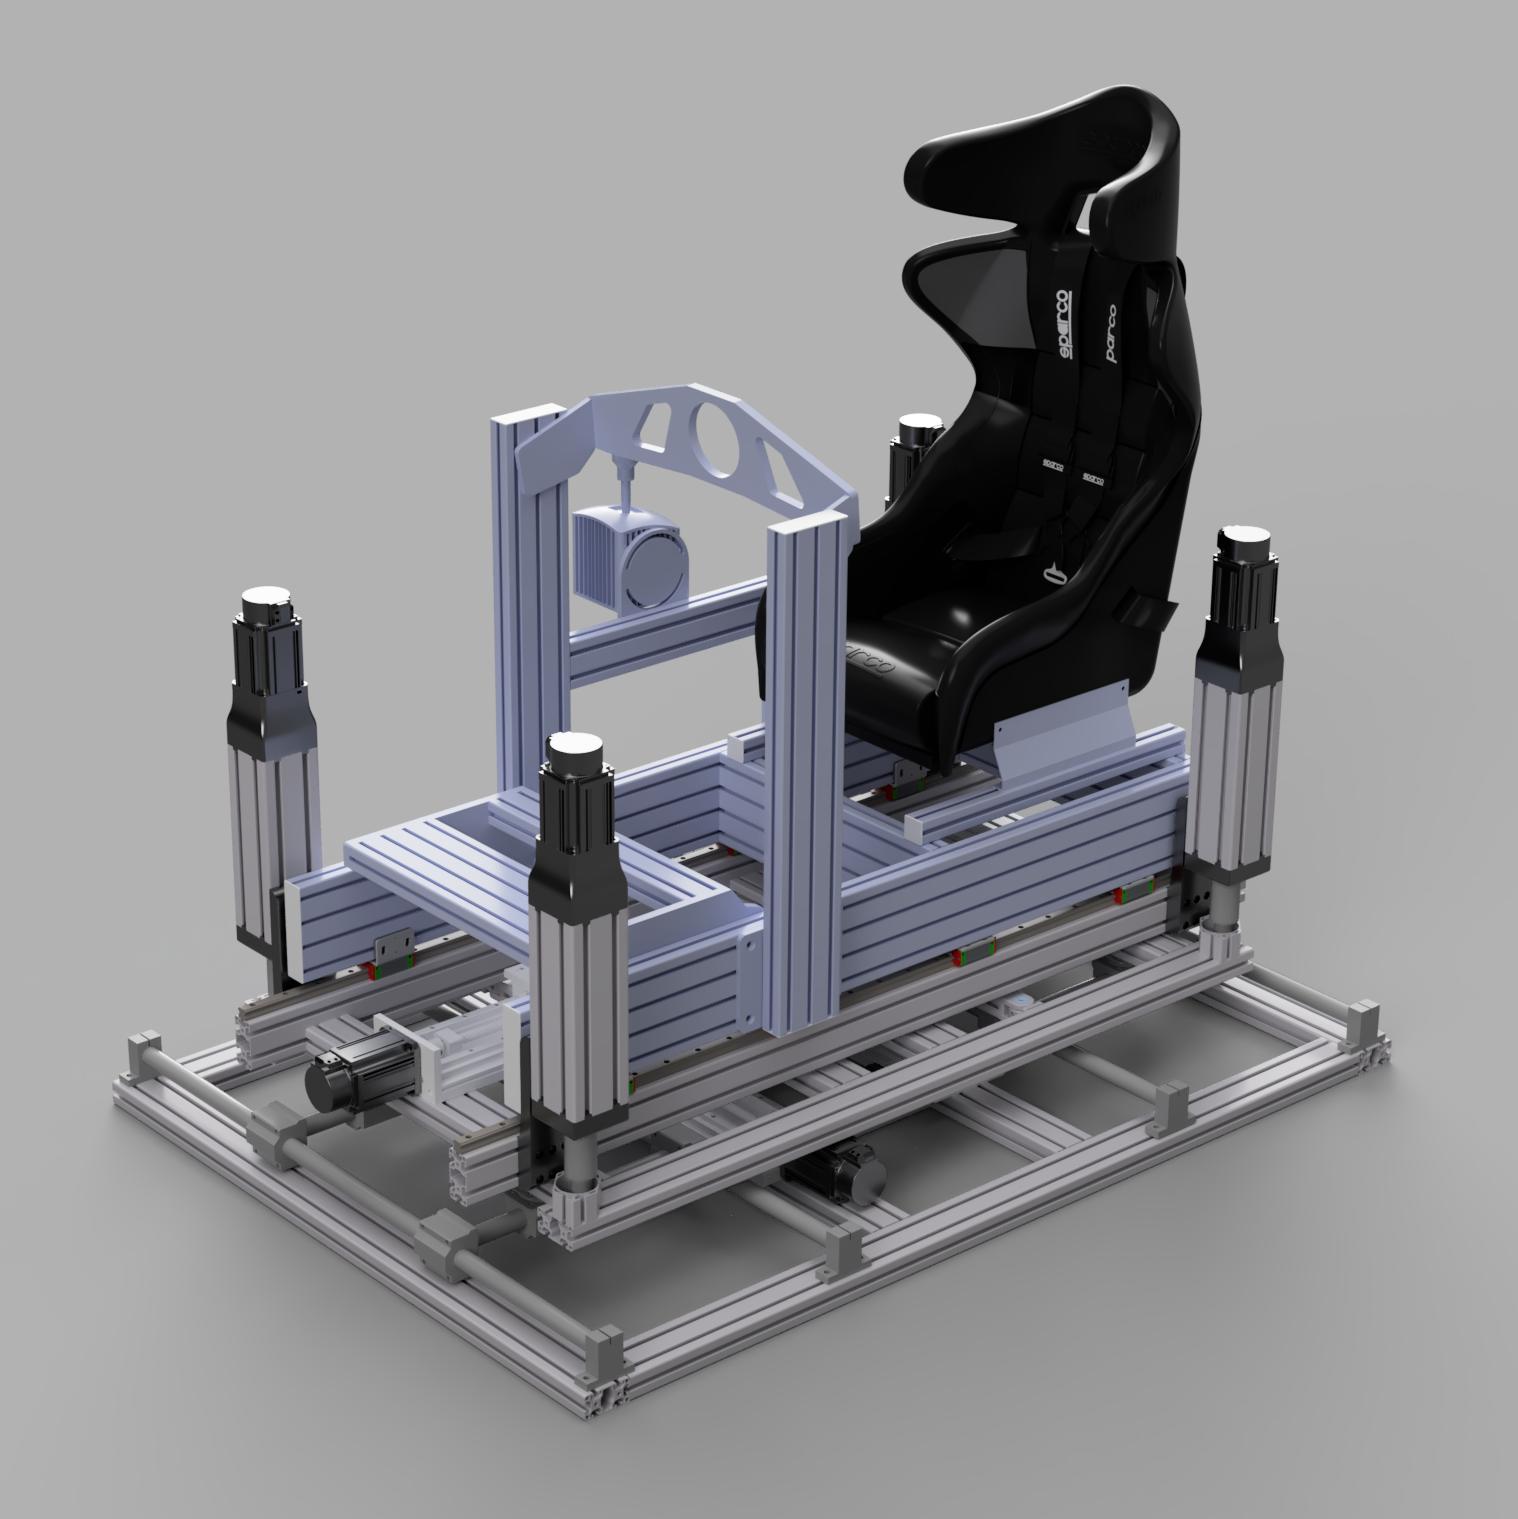 compact-6dof-platform-4k-sq.png